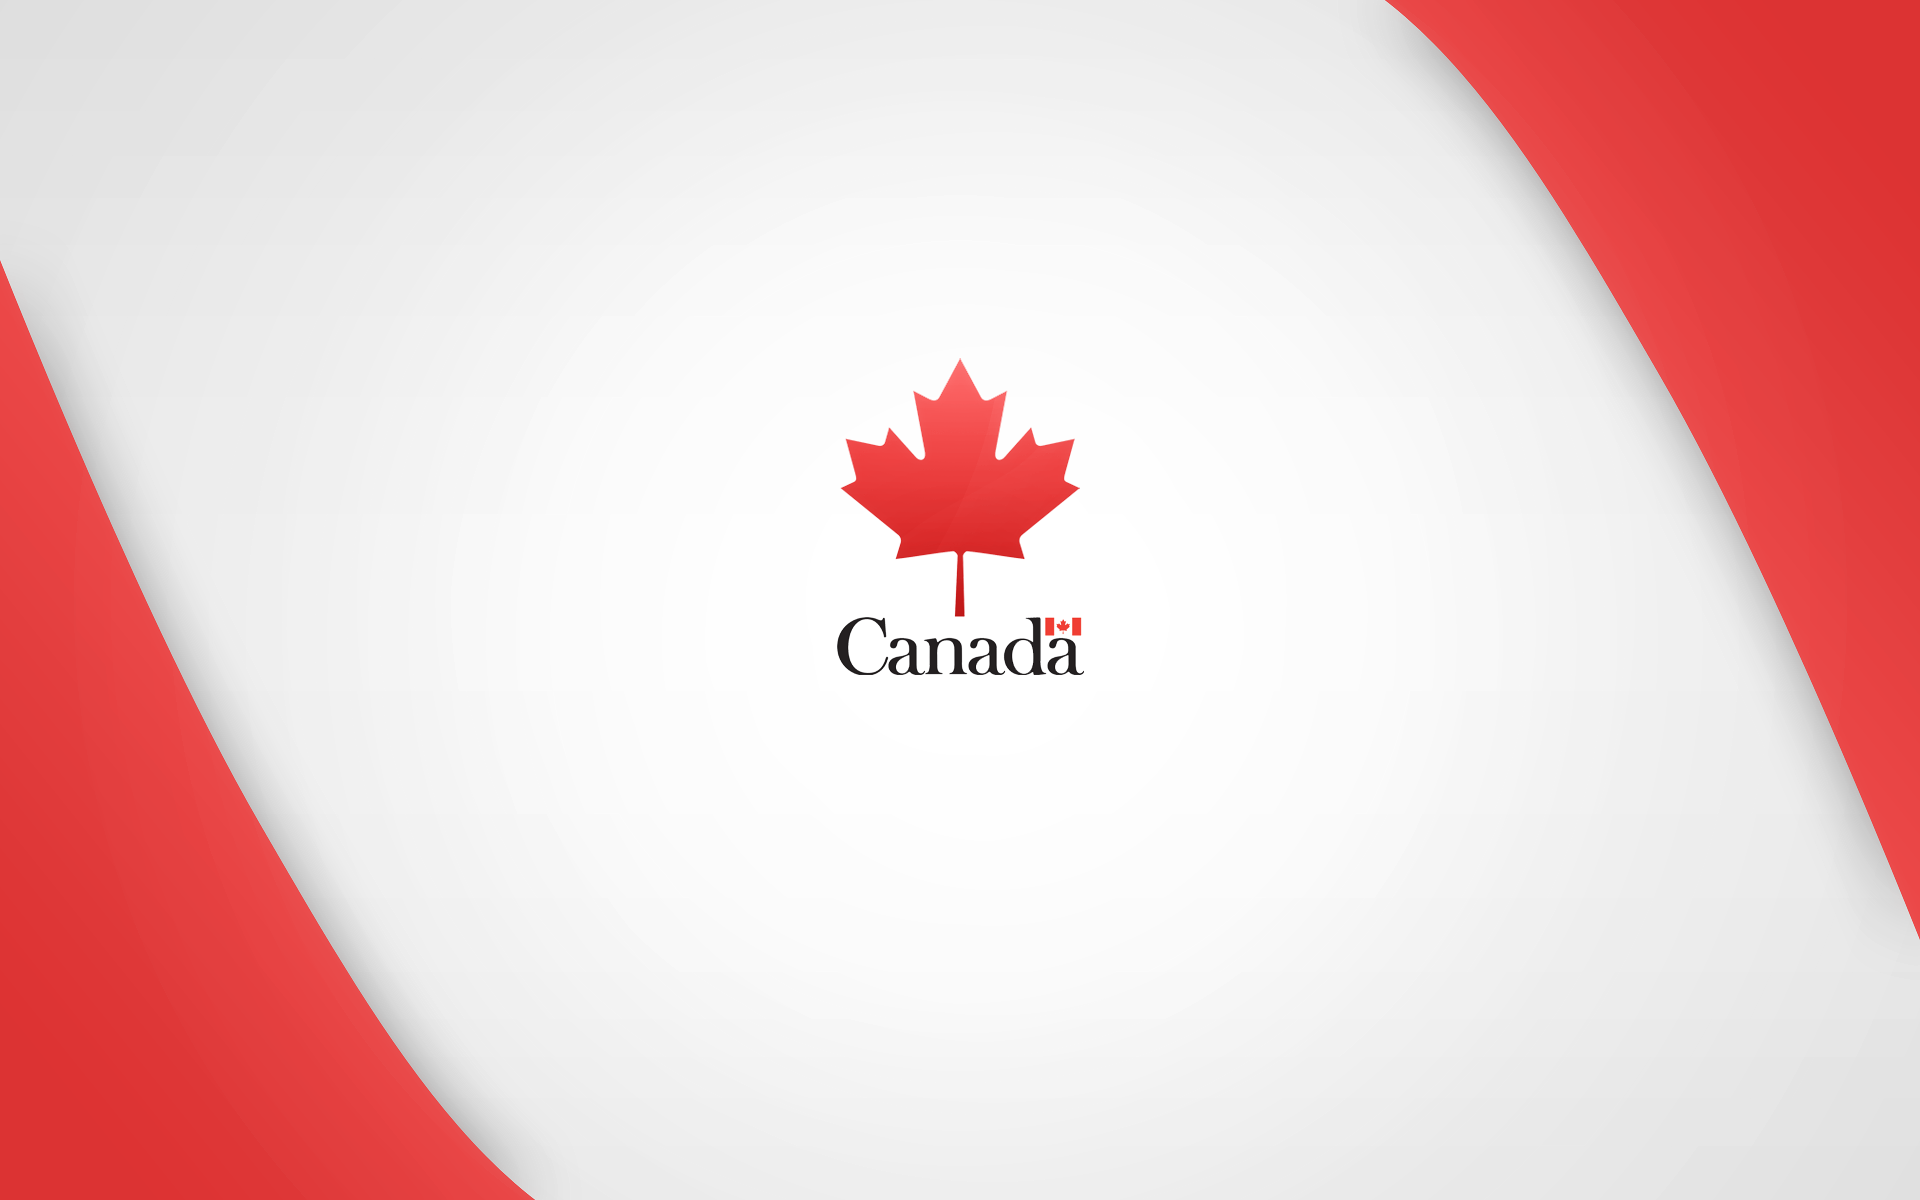 Flag Of Canada Computer Wallpapers, Desktop Backgrounds